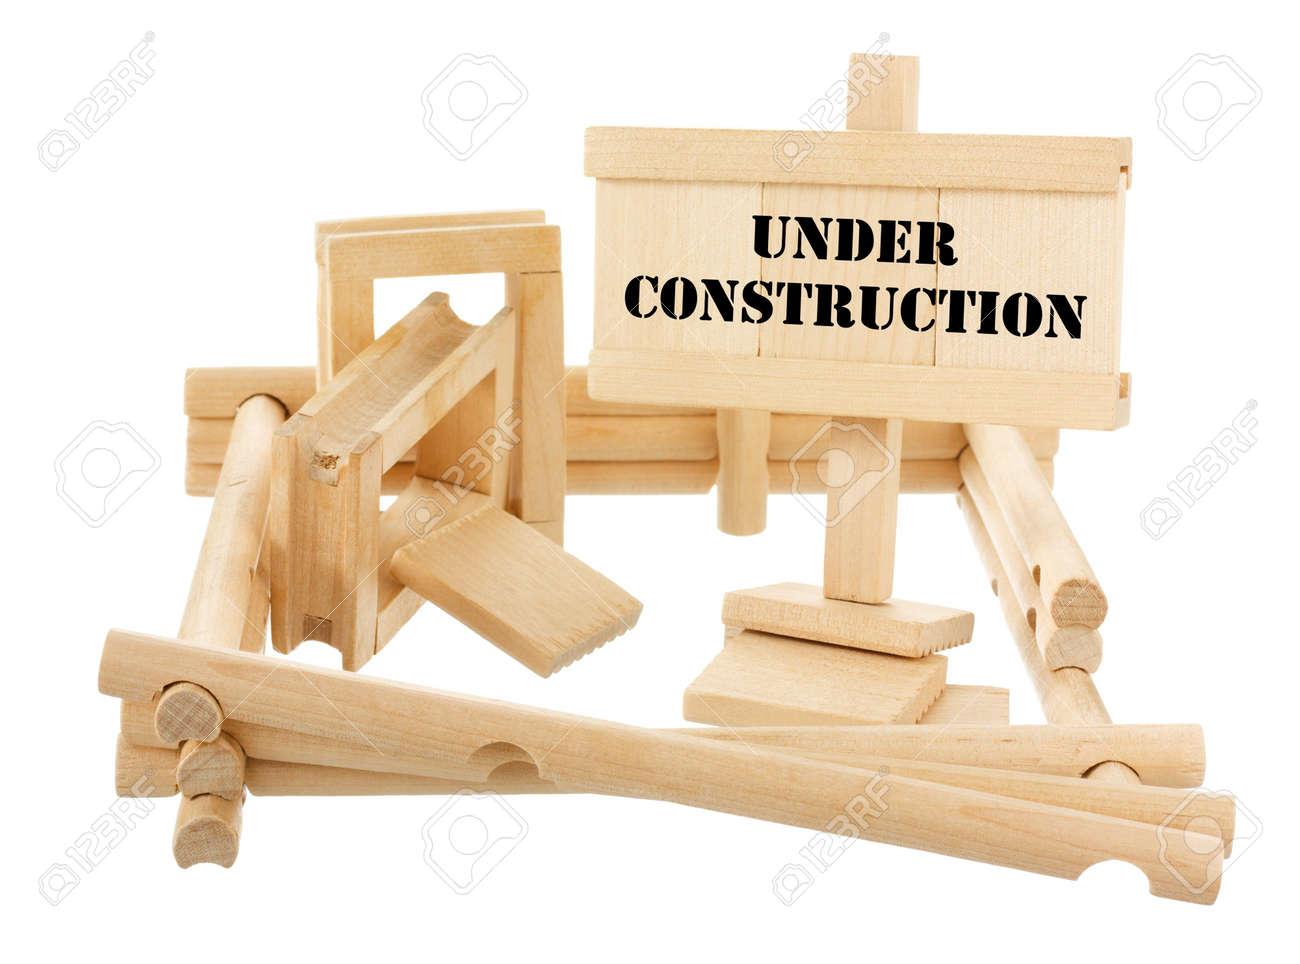 Under construction unfinished wooden house isolated on white Stock Photo - 13824110